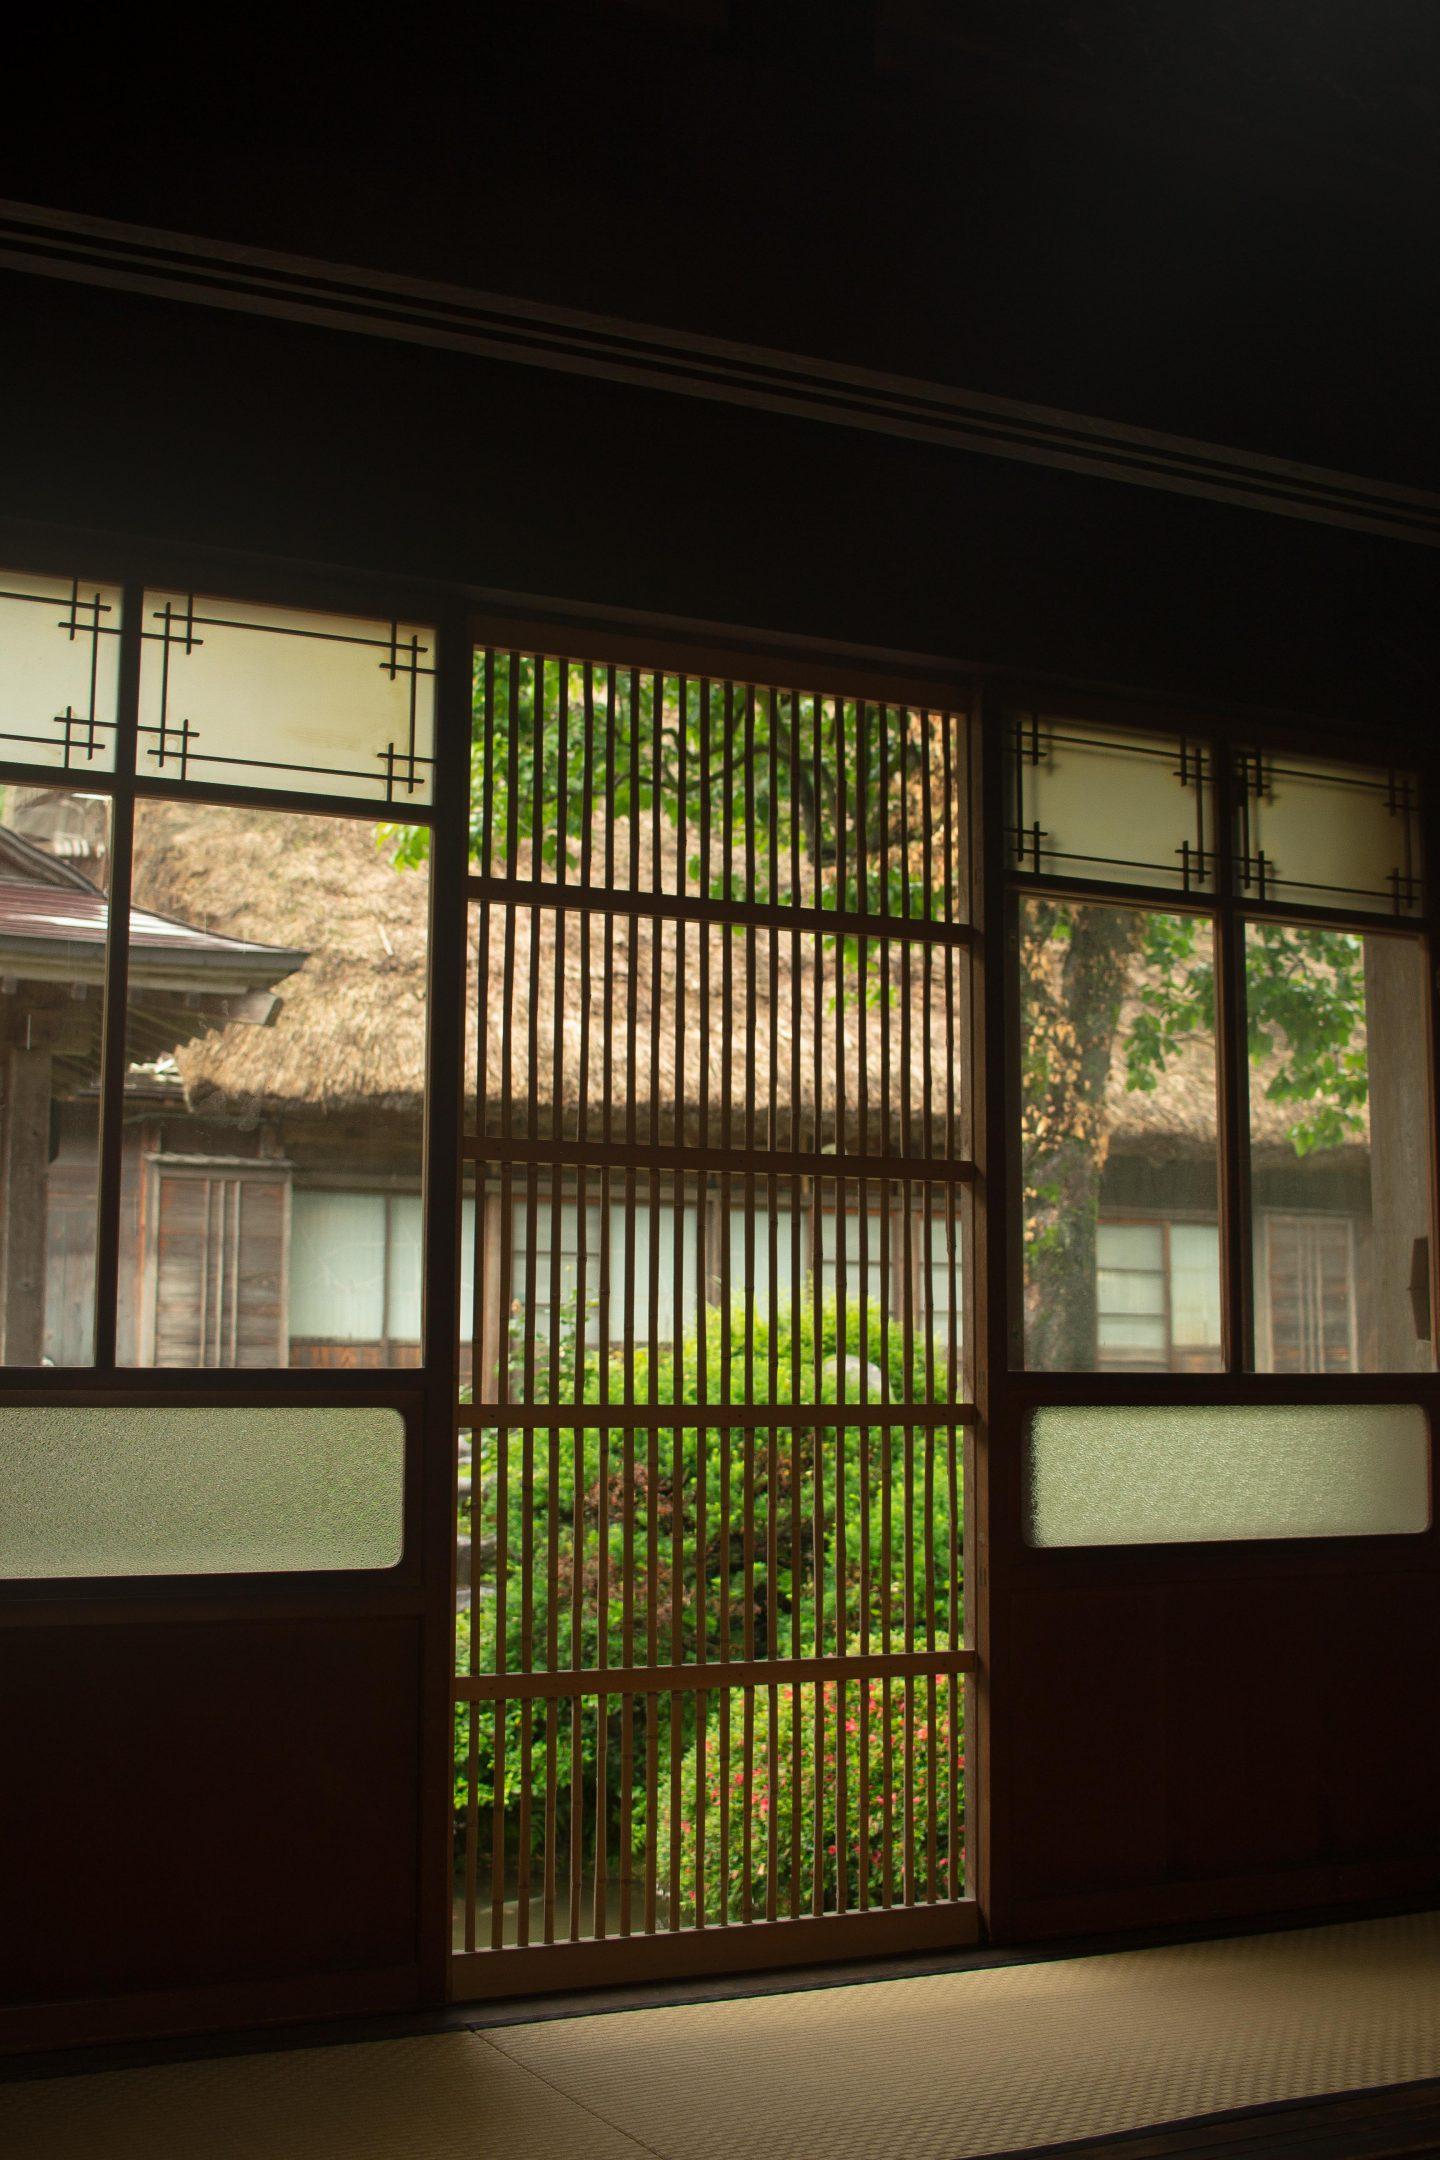 shirakawago travel tips window